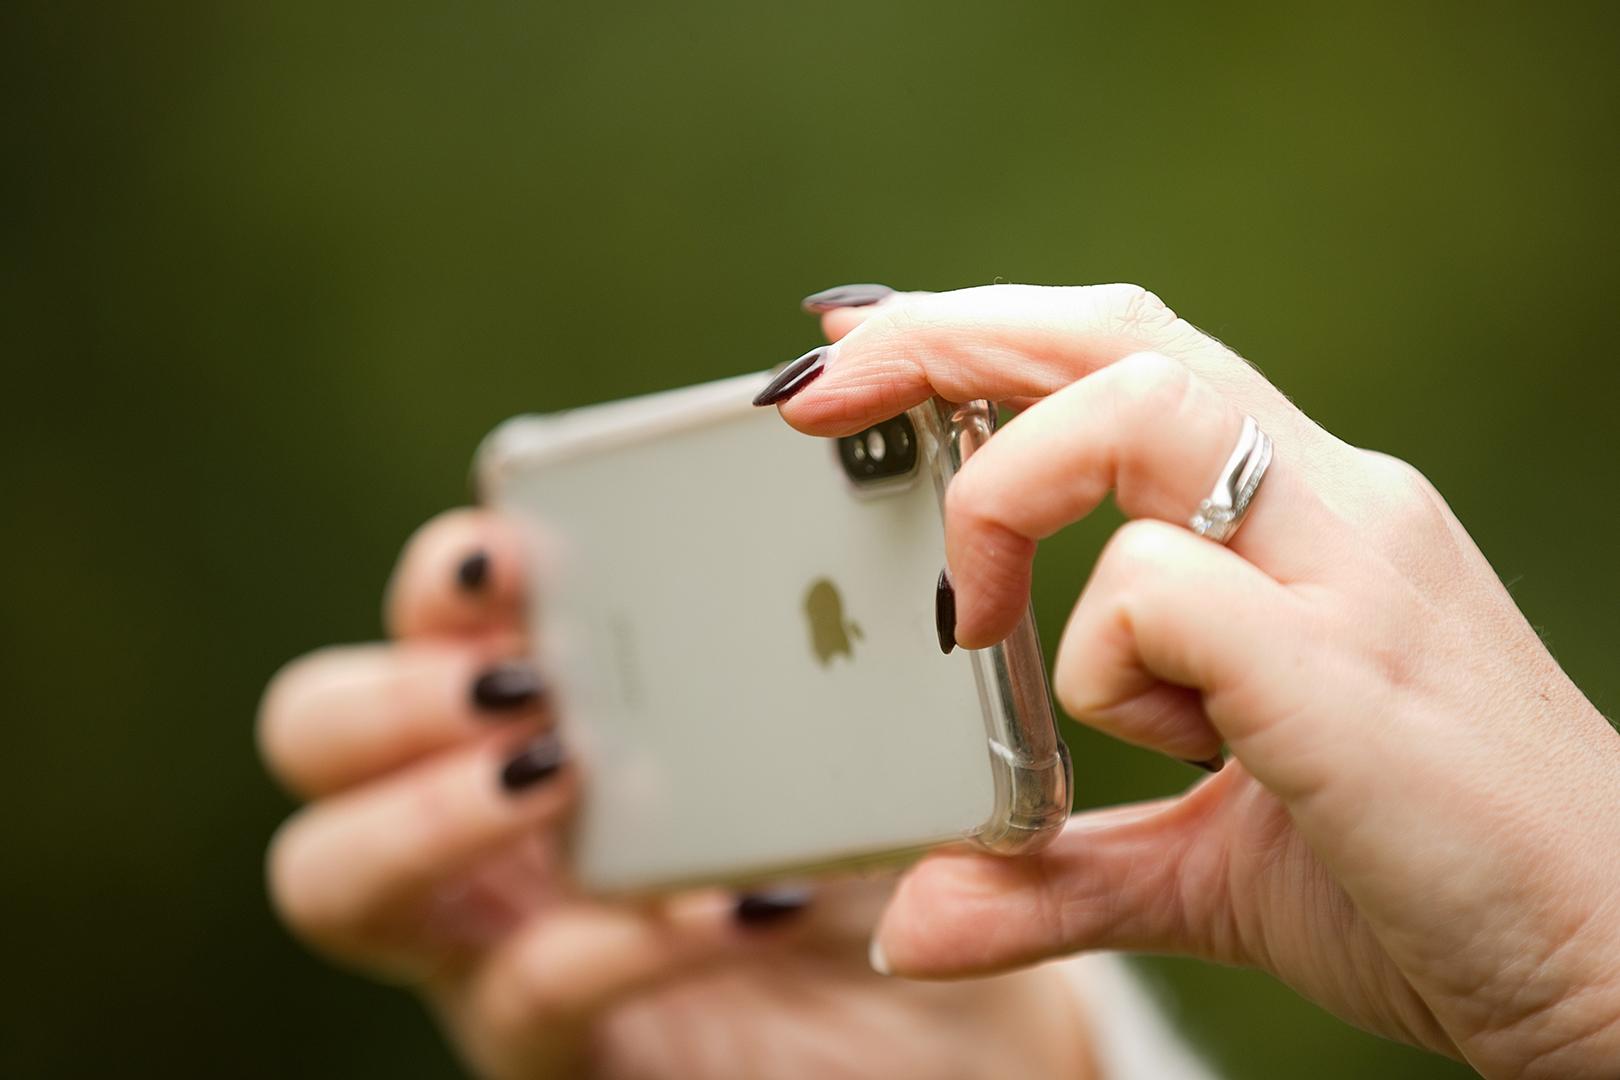 Phone vs. DSLR